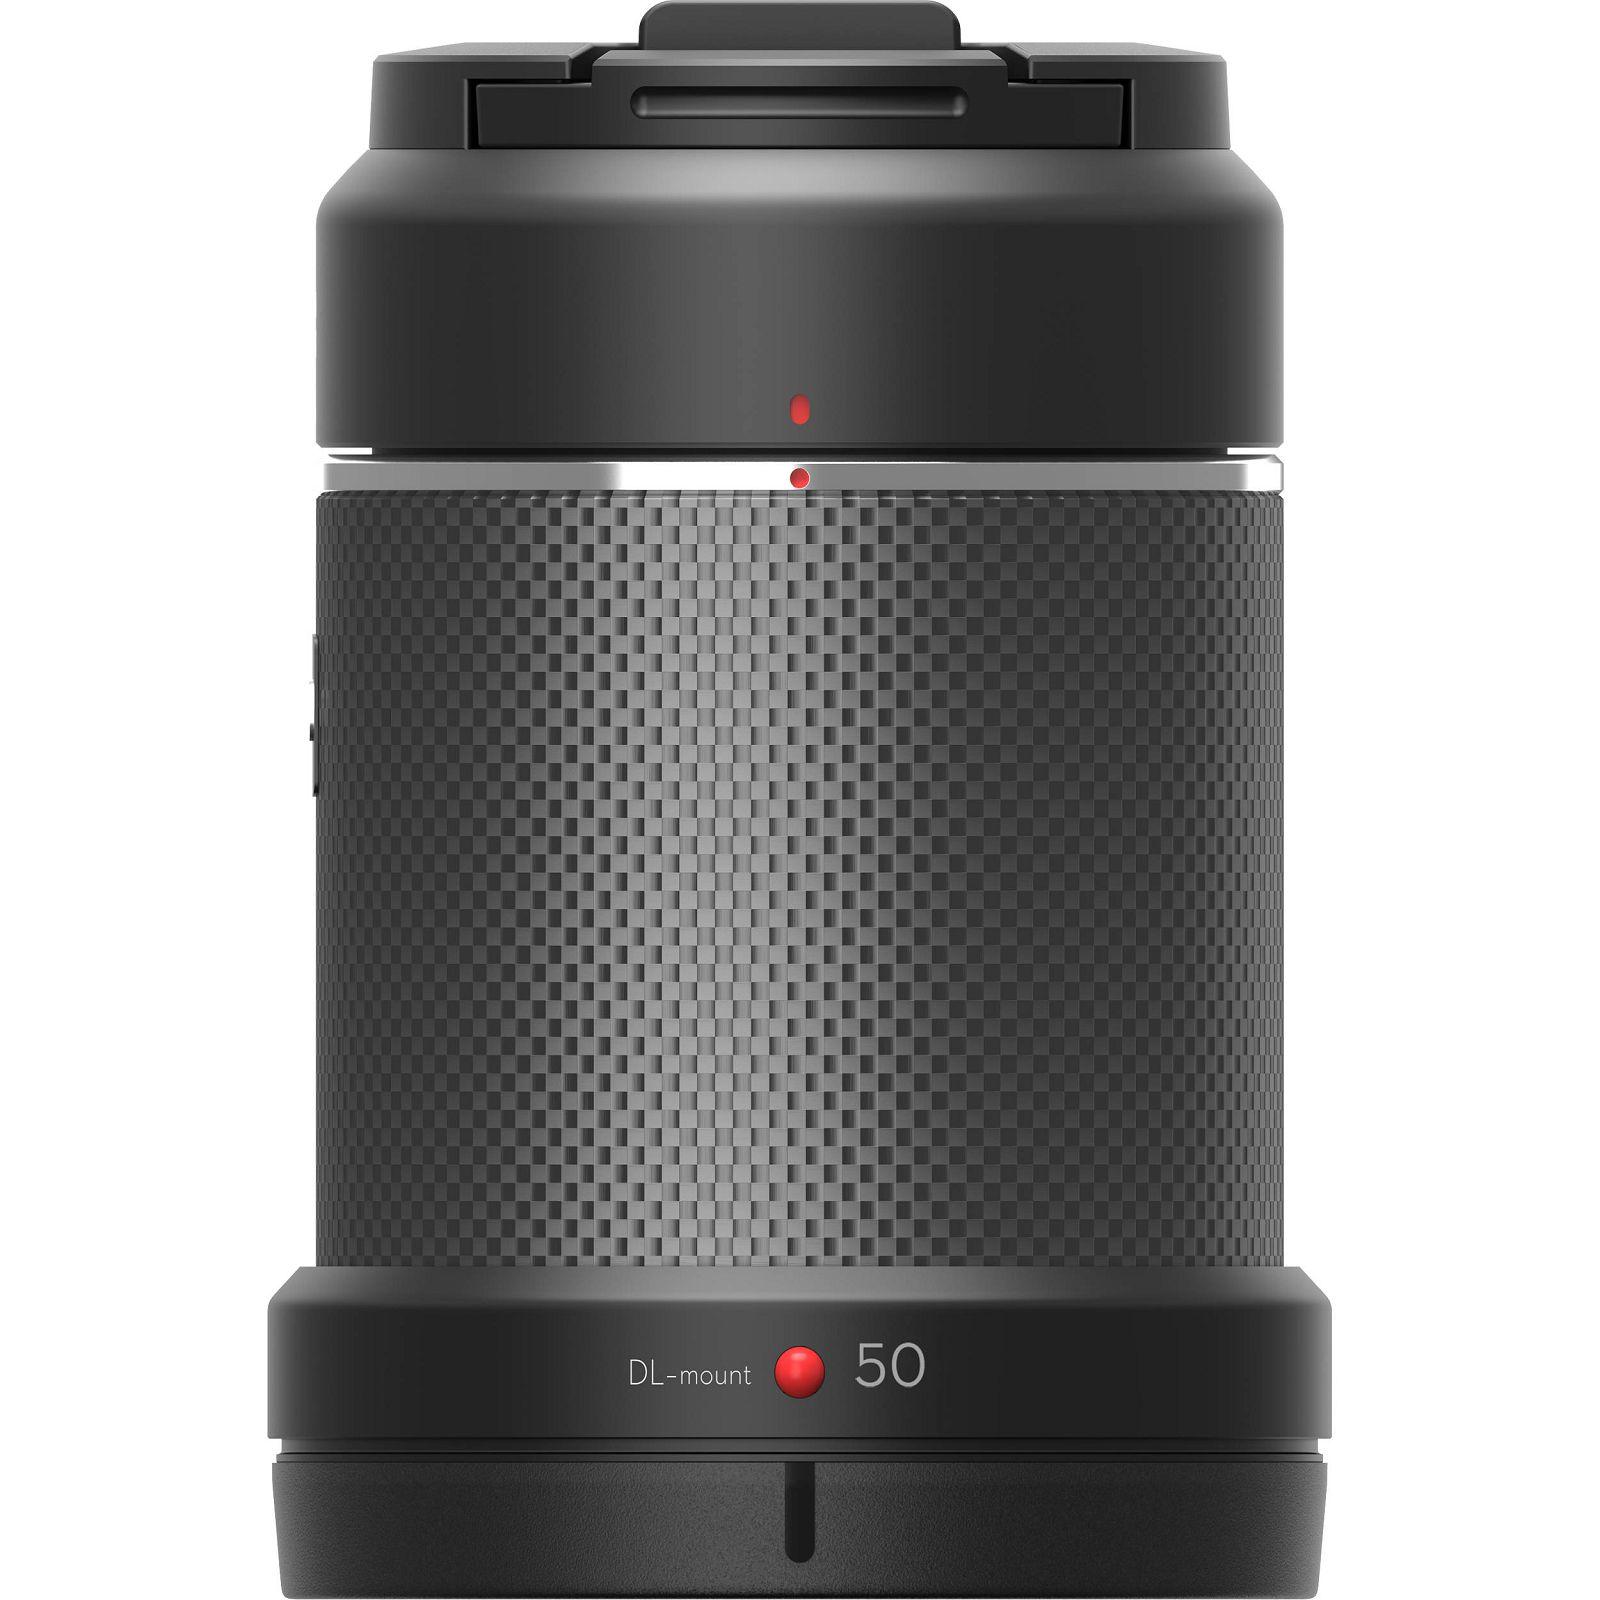 DJI Zenmuse X7 Spare Part 4 DL 50mm f/2.8 LS ASPH Lens standardni objektiv za kameru drona